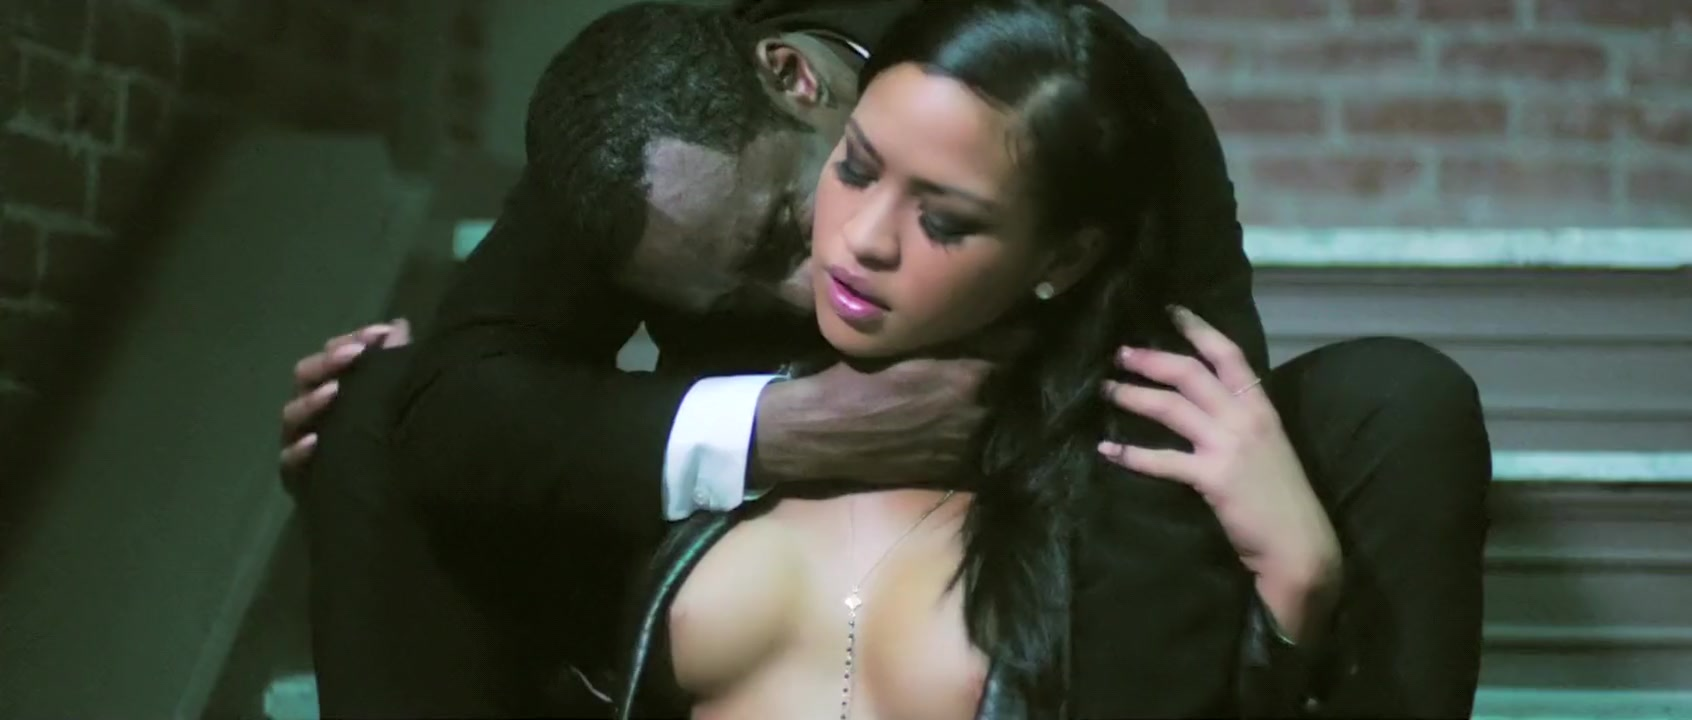 Hot xXx Video Xxx fucking movie clip